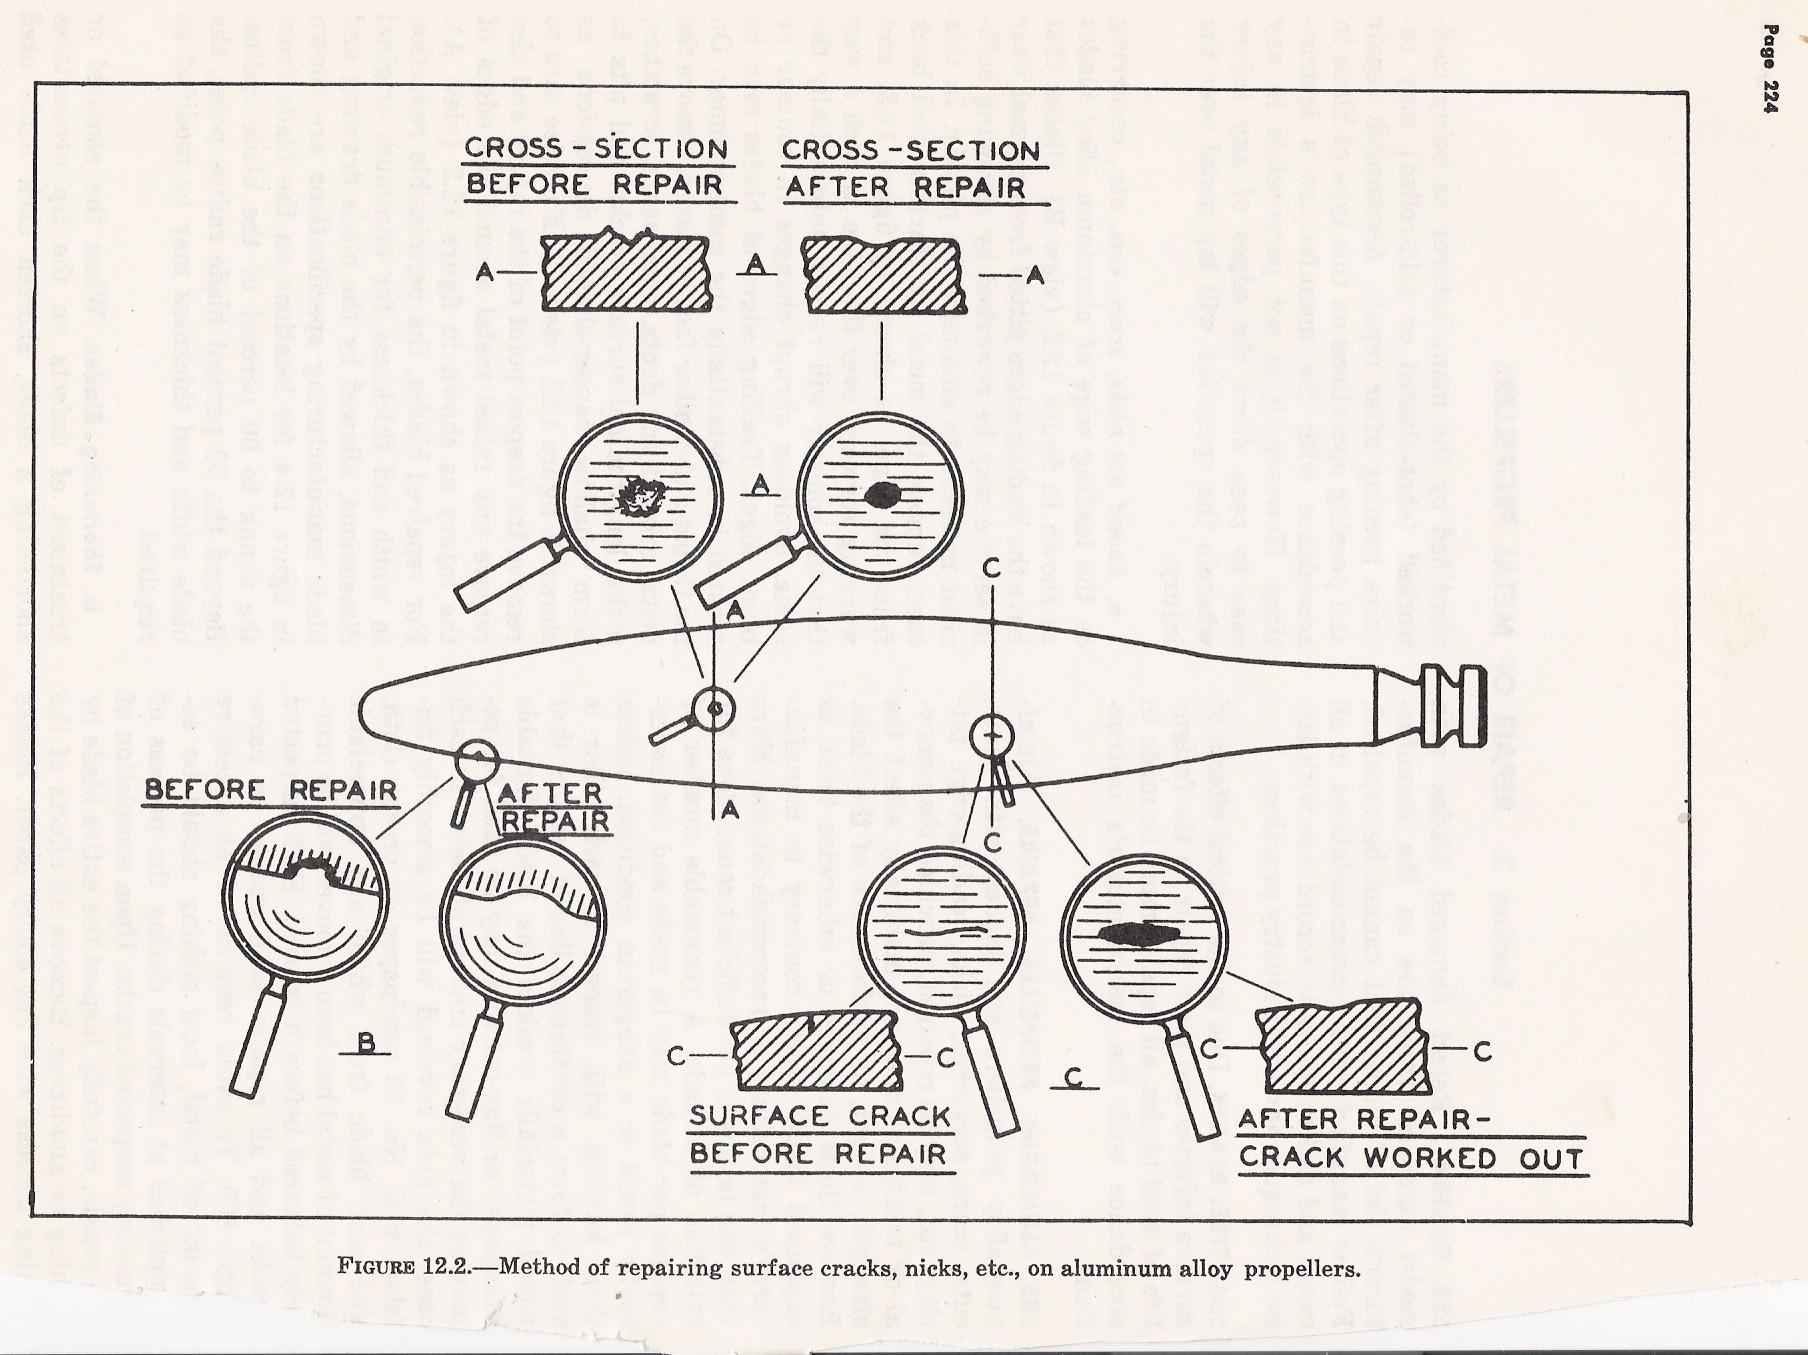 Faa response to mandatory maintenance intervals engine/rotax.